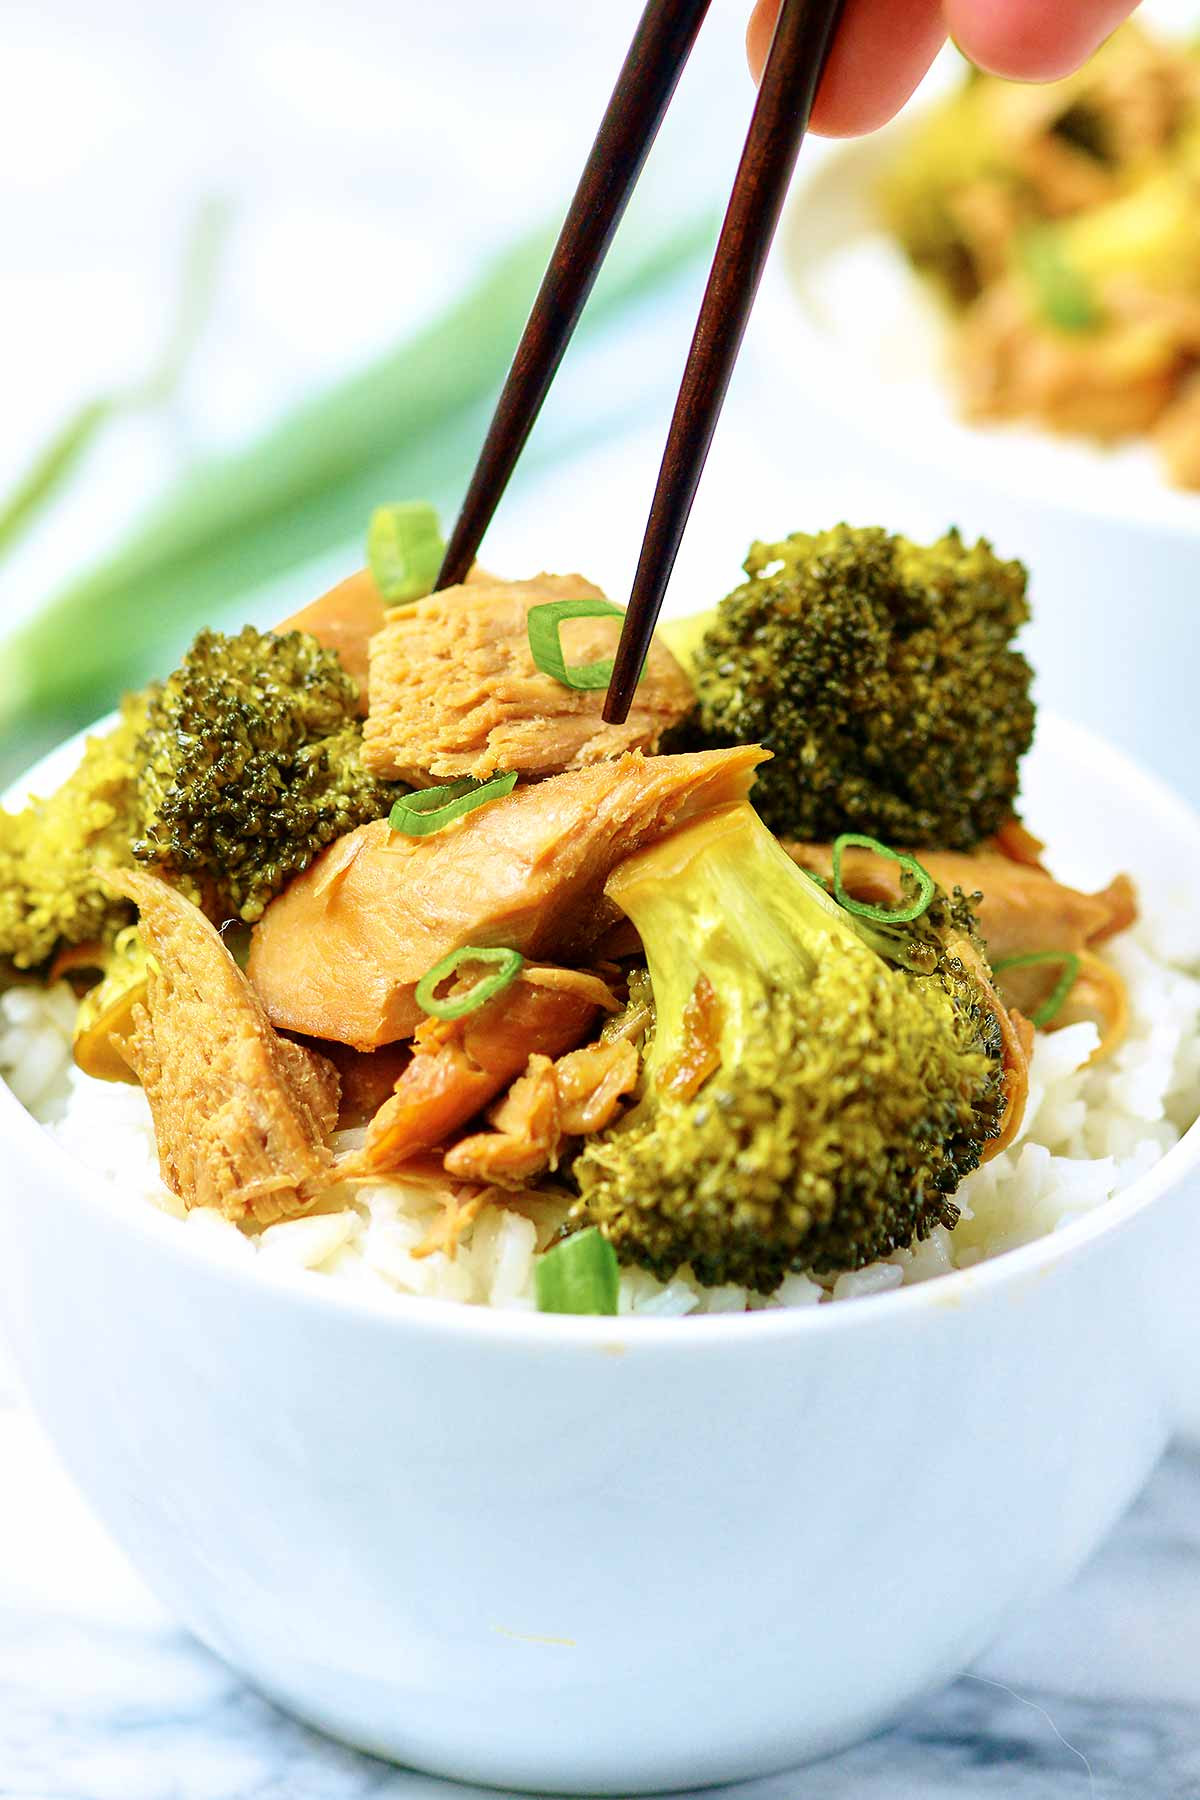 Chinese Chicken And Broccoli Recipe  Crockpot Chicken and Broccoli Recipe Healthy Chinese Chicken